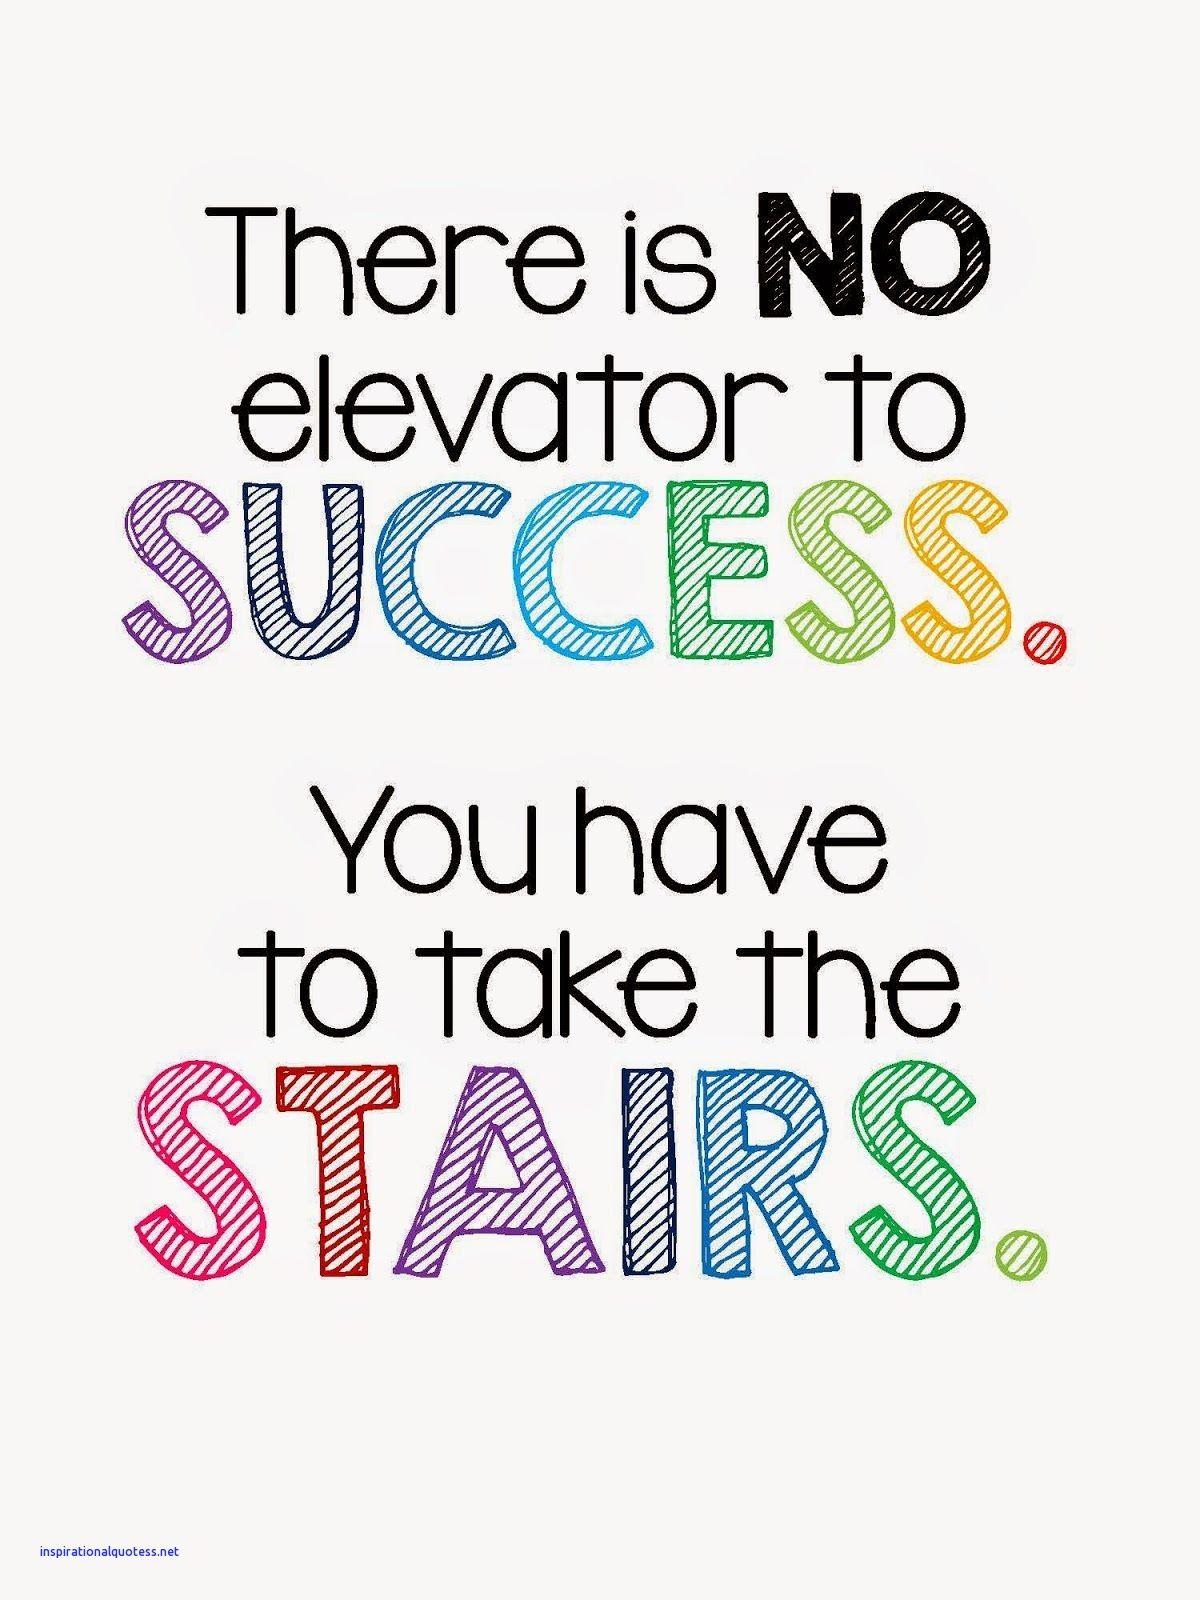 Success Education Quotes : success, education, quotes, Education, Success, Quotes, Inspiration